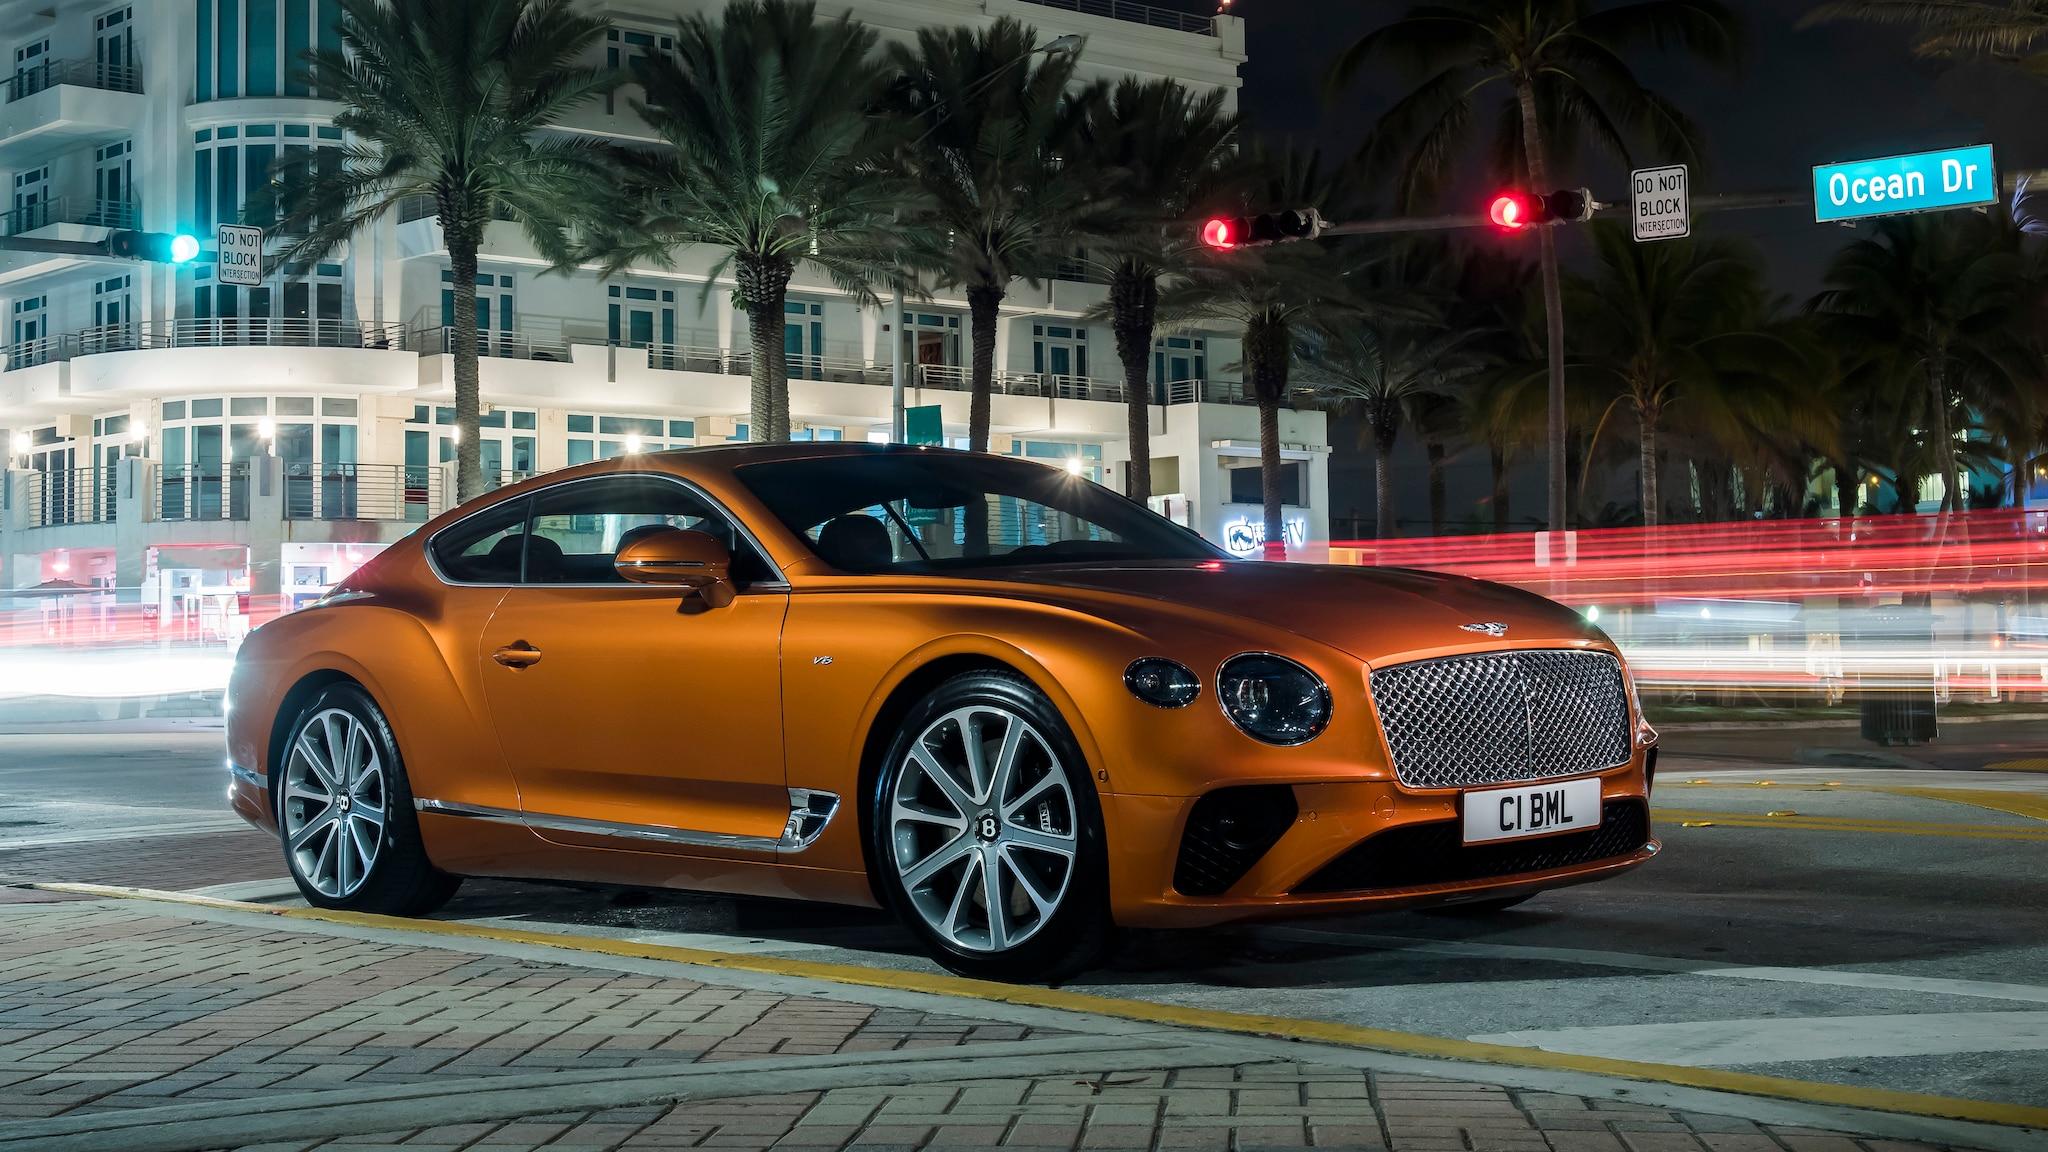 Bentley Continental GT V8 17